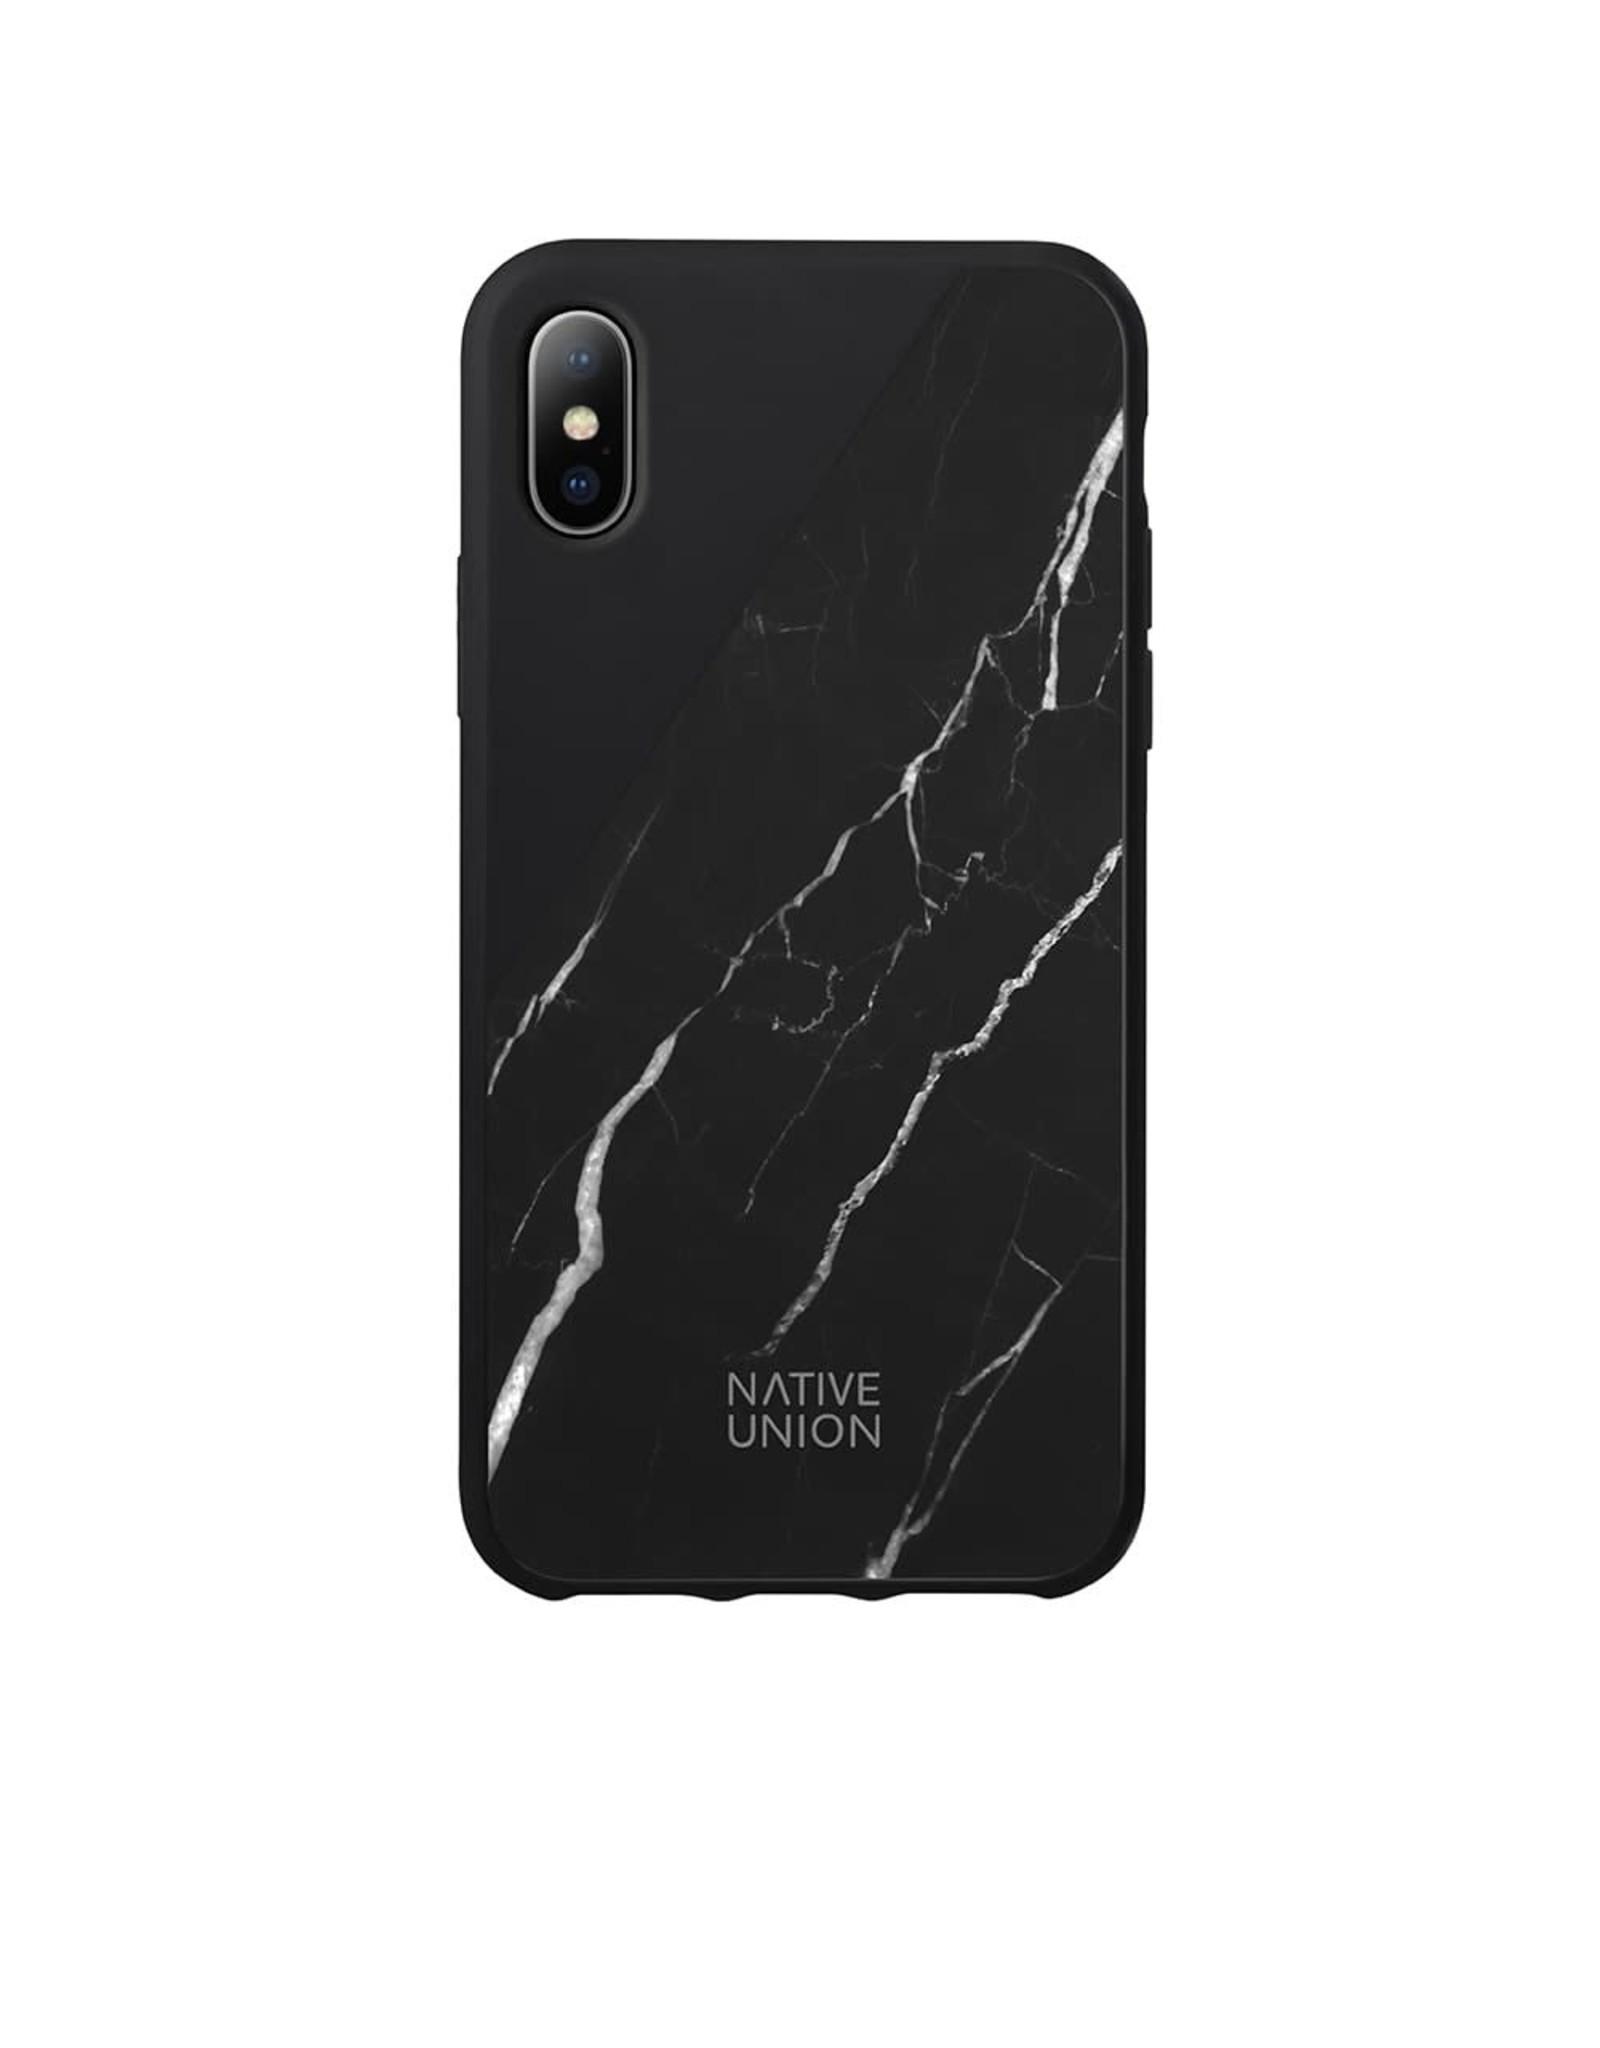 Native Union Native Union iPhone X Clic Marble - Black EOL